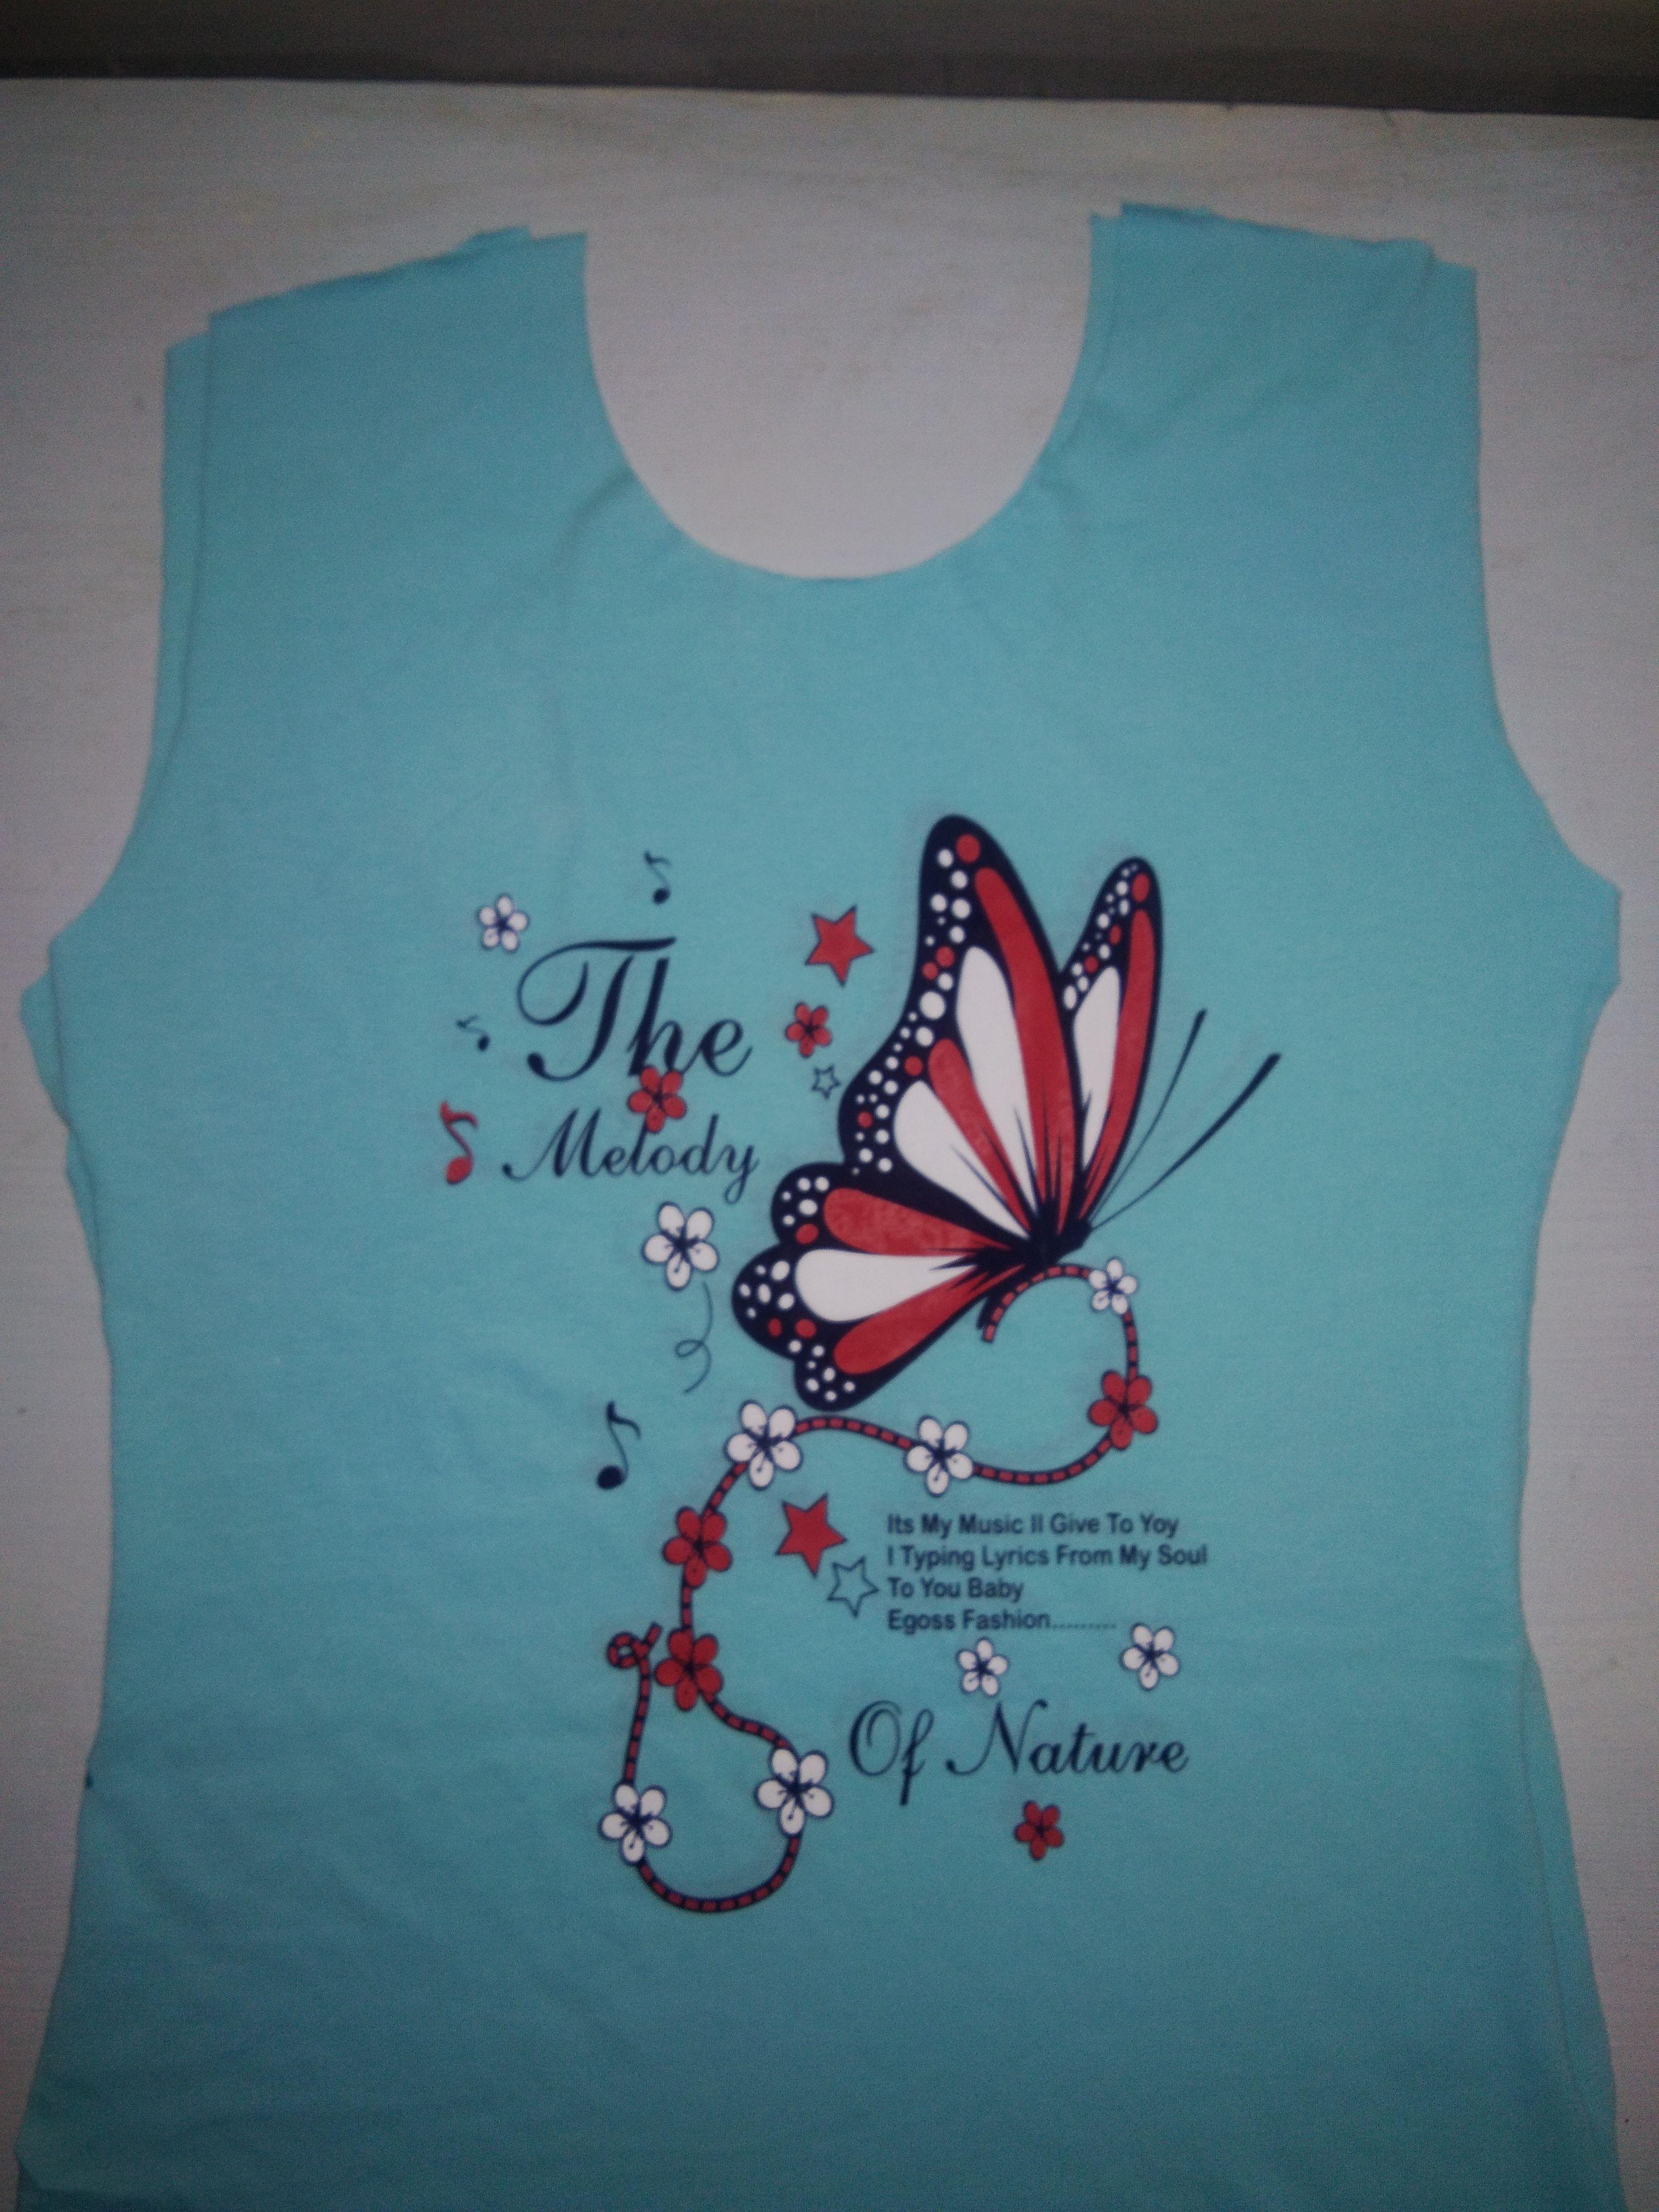 cf3b8dd9b Painted Clothes, Girls Tees, Shirt Print Design, Summer Kids, Baby Boy  Outfits